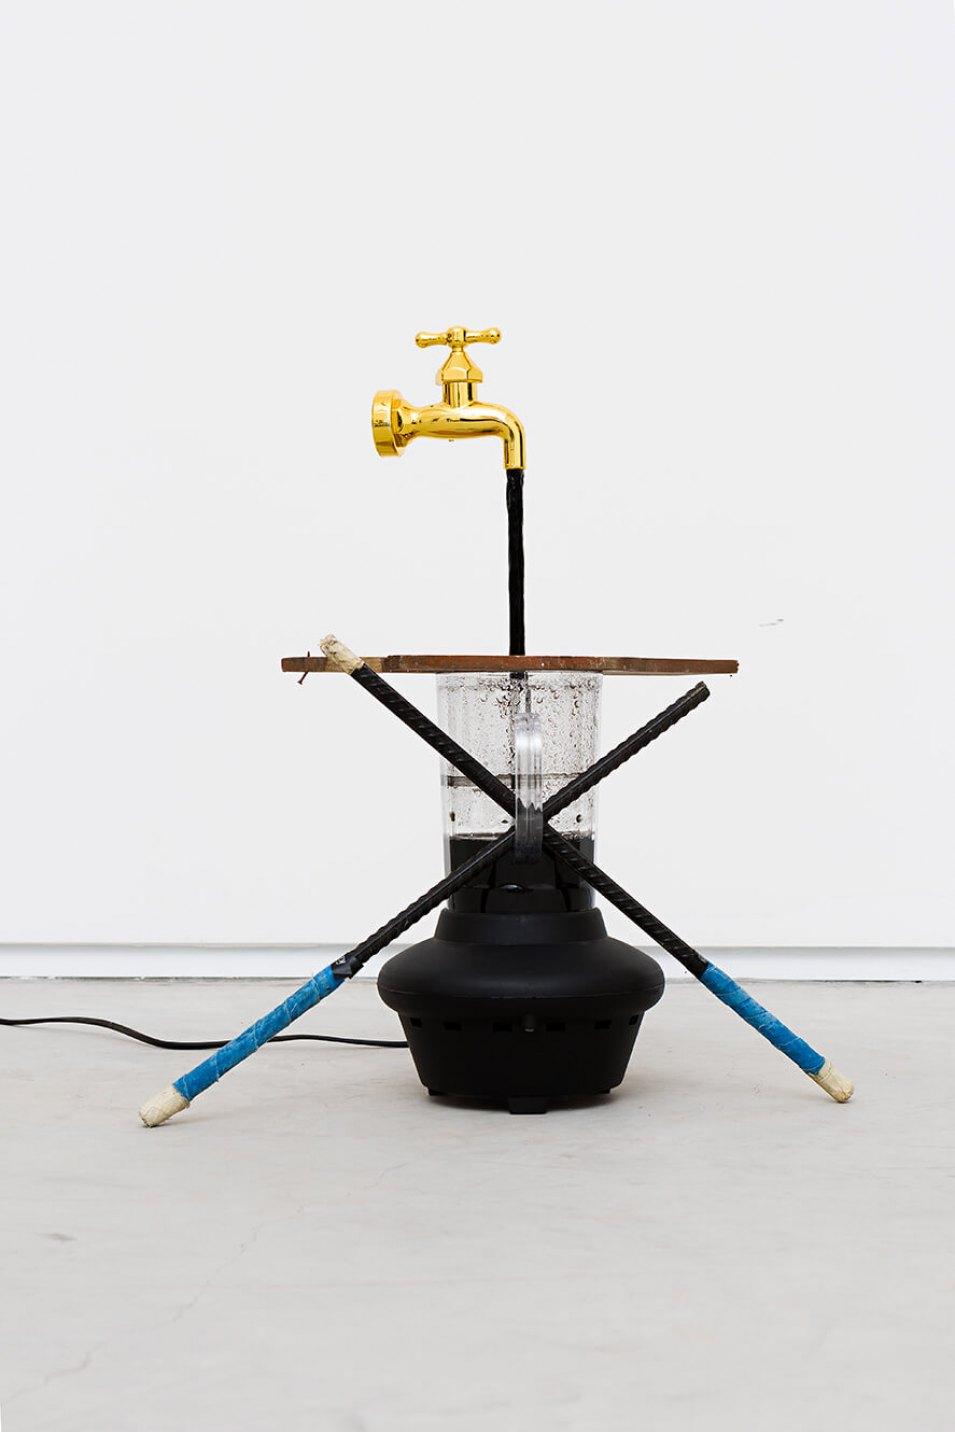 Deyson Gilbert,&nbsp;<em>volume morto</em>,&nbsp;2014,&nbsp;plastic, iron, wood, water, China ink and water pump, 264 × 300 × 4 cm - Mendes Wood DM